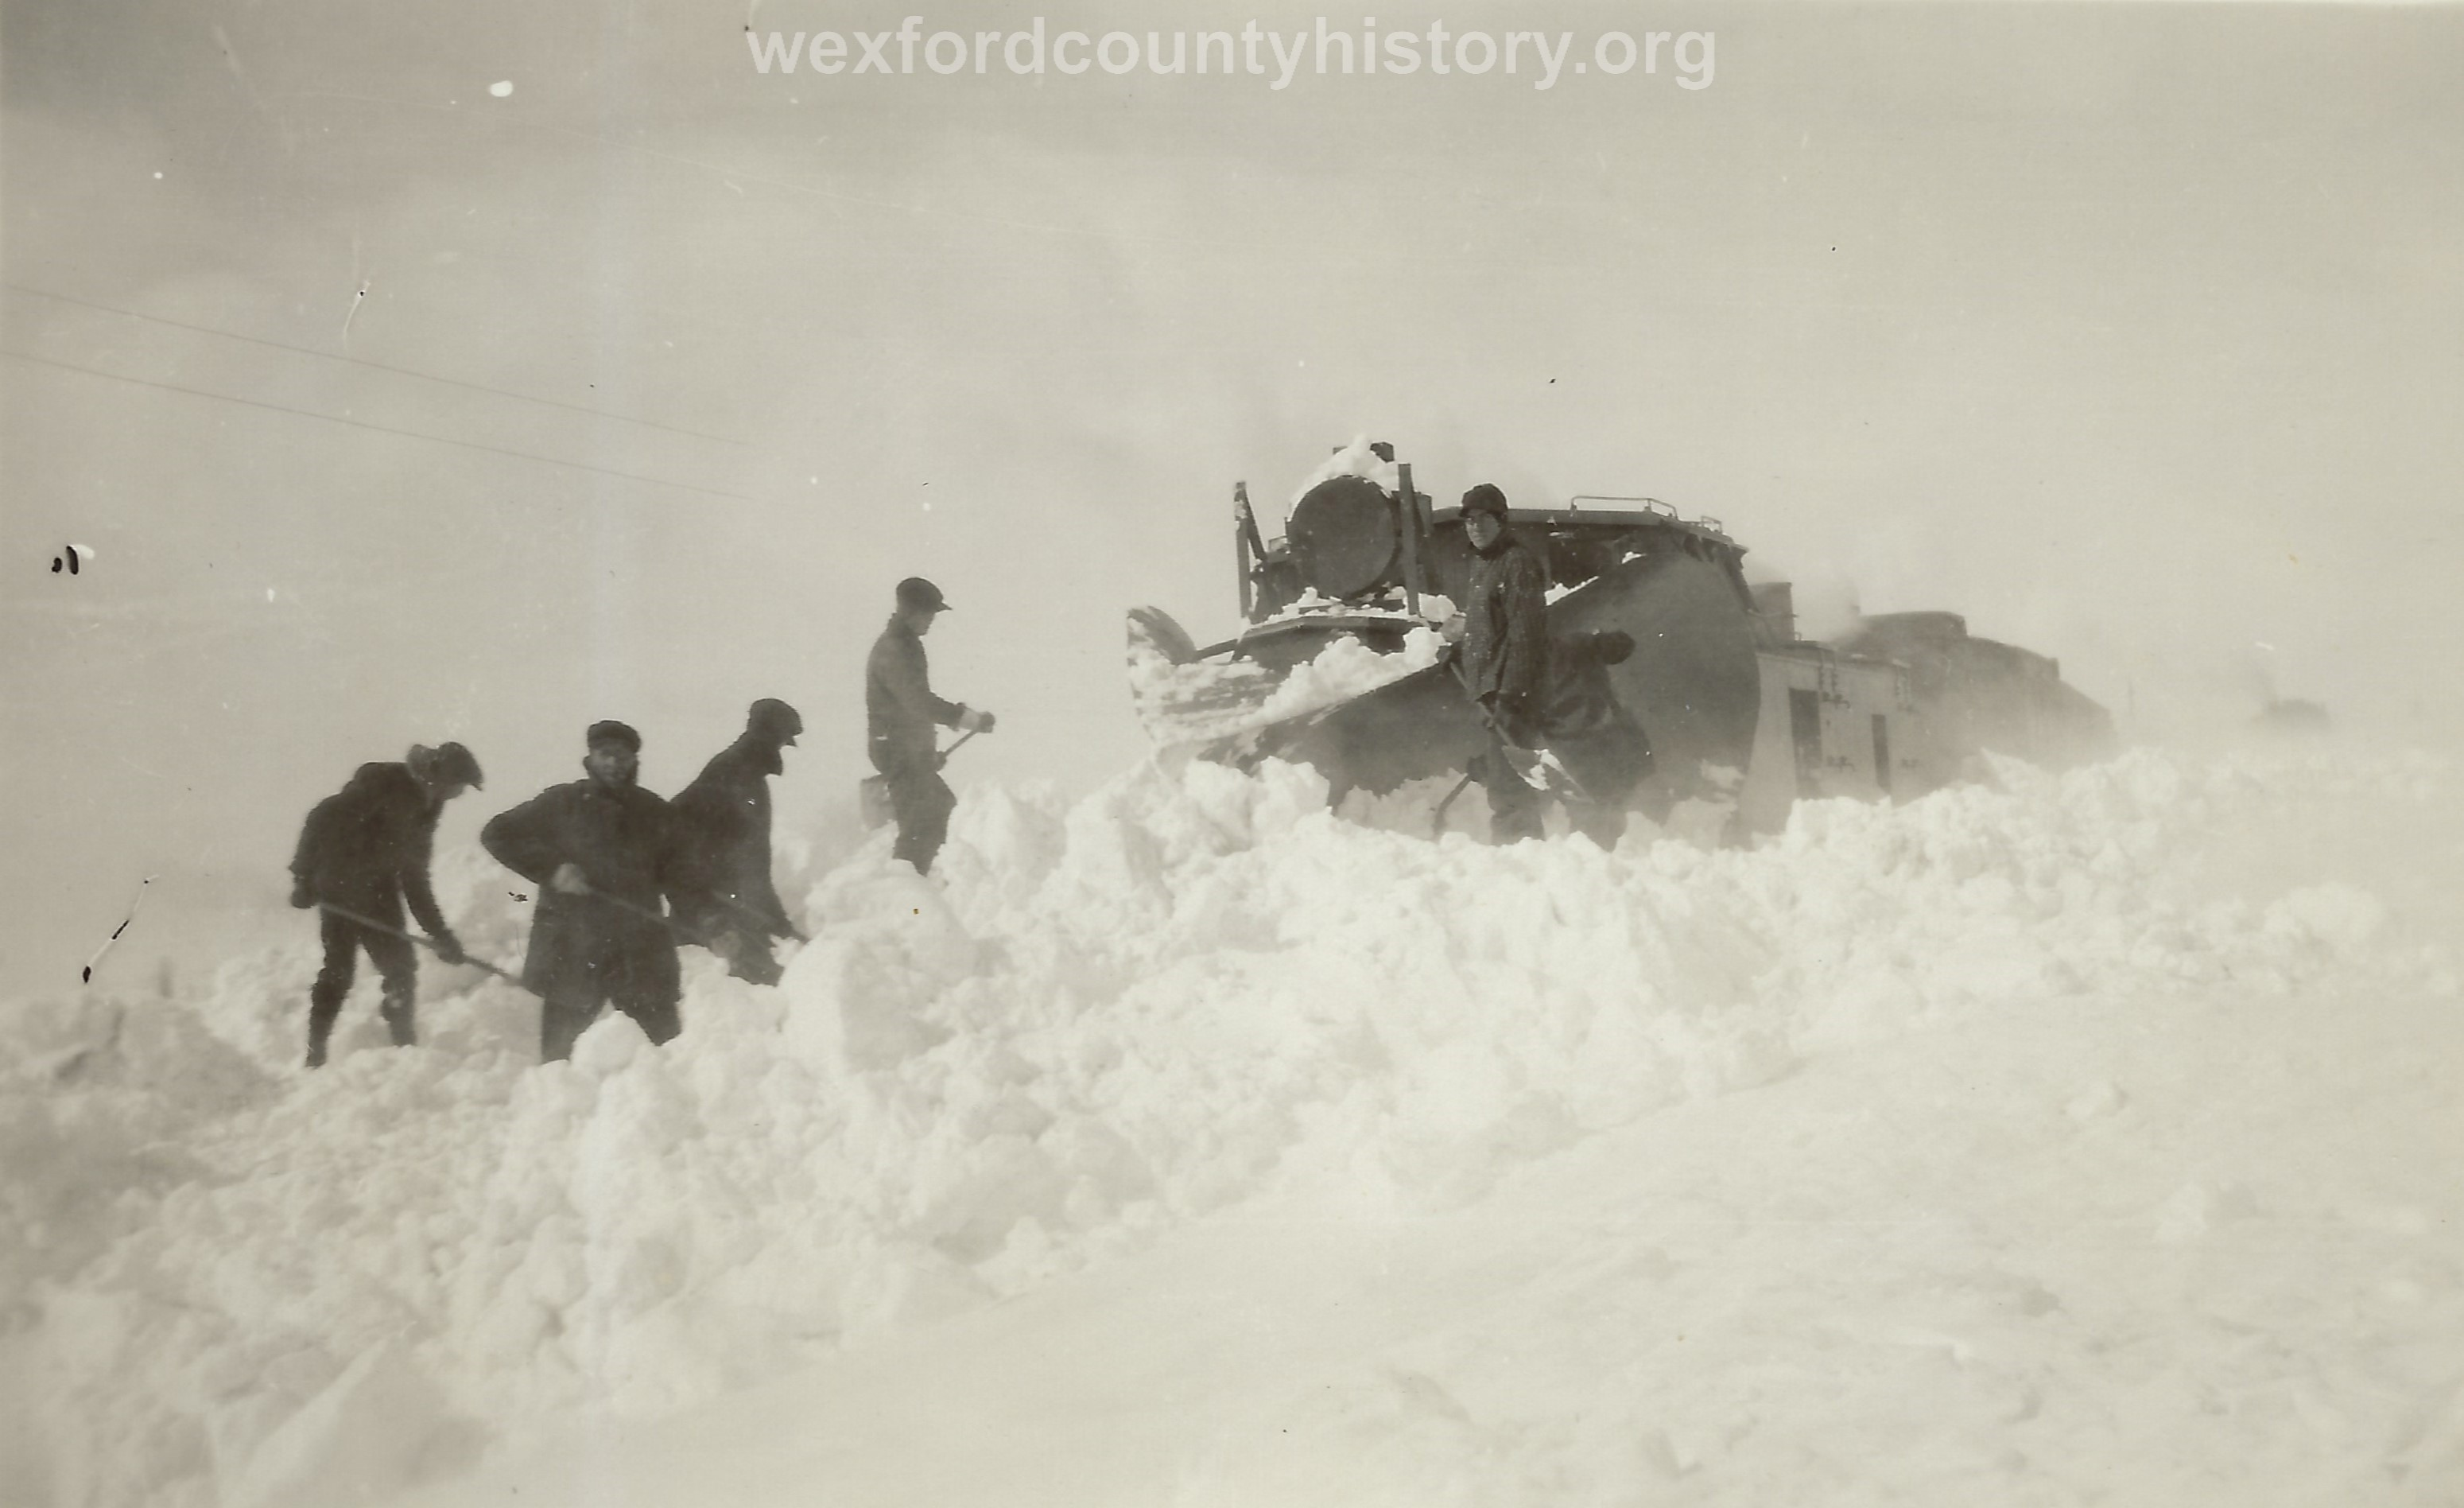 Cadillac-Railroad-Snow-Plow